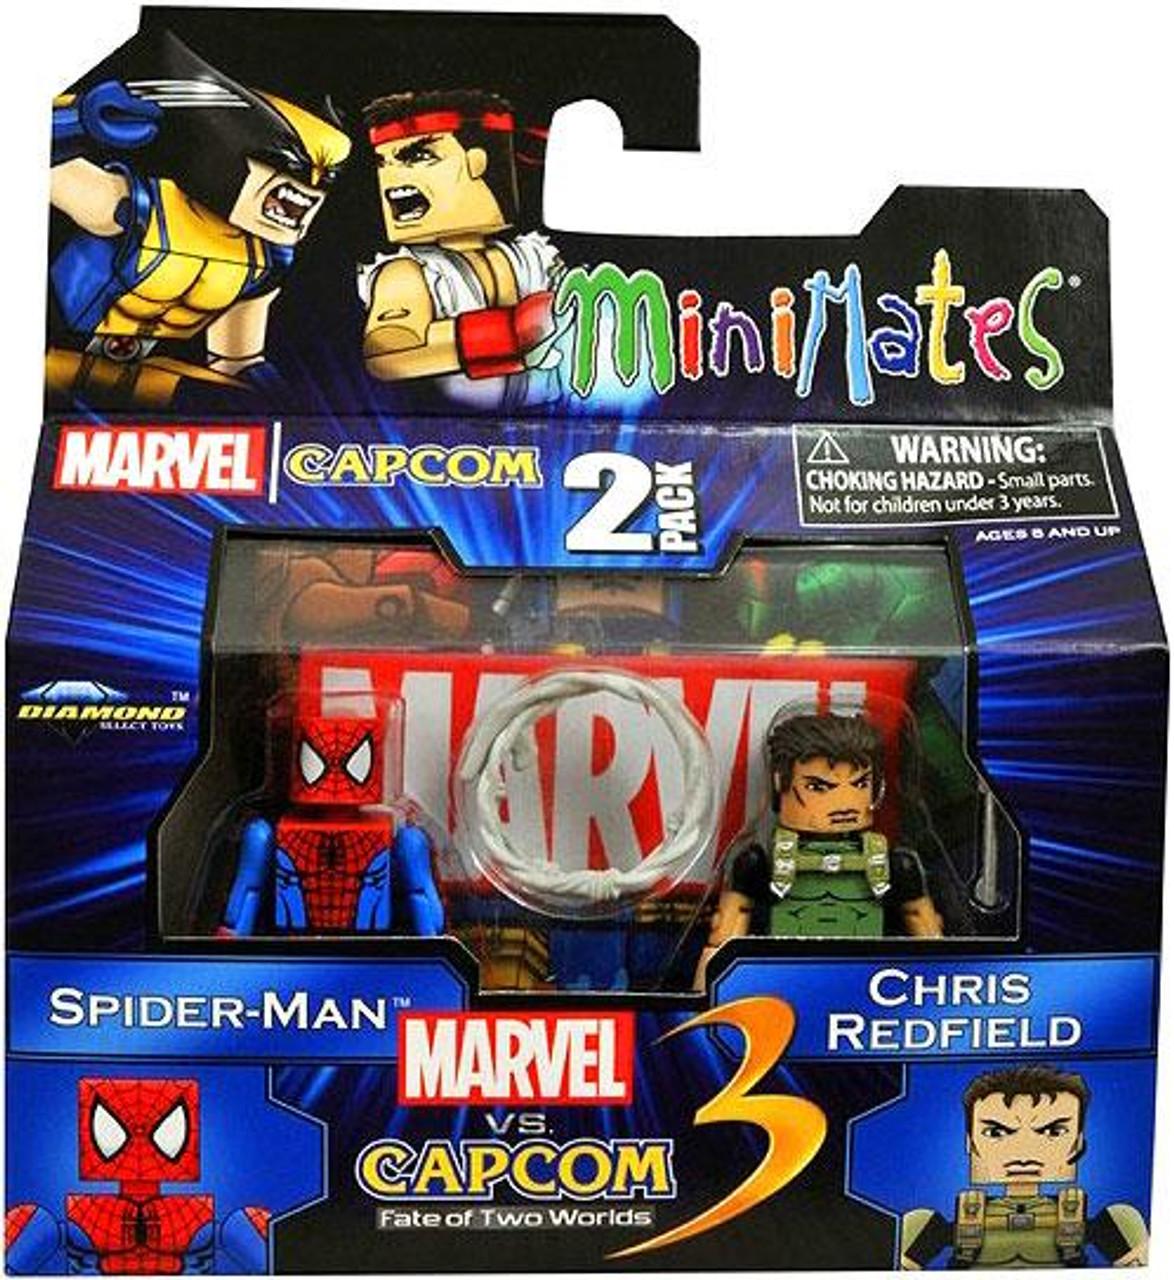 Marvel vs Capcom 3 Minimates Series 2 Spider-Man Vs. Chris Redfield Minifigure 2-Pack